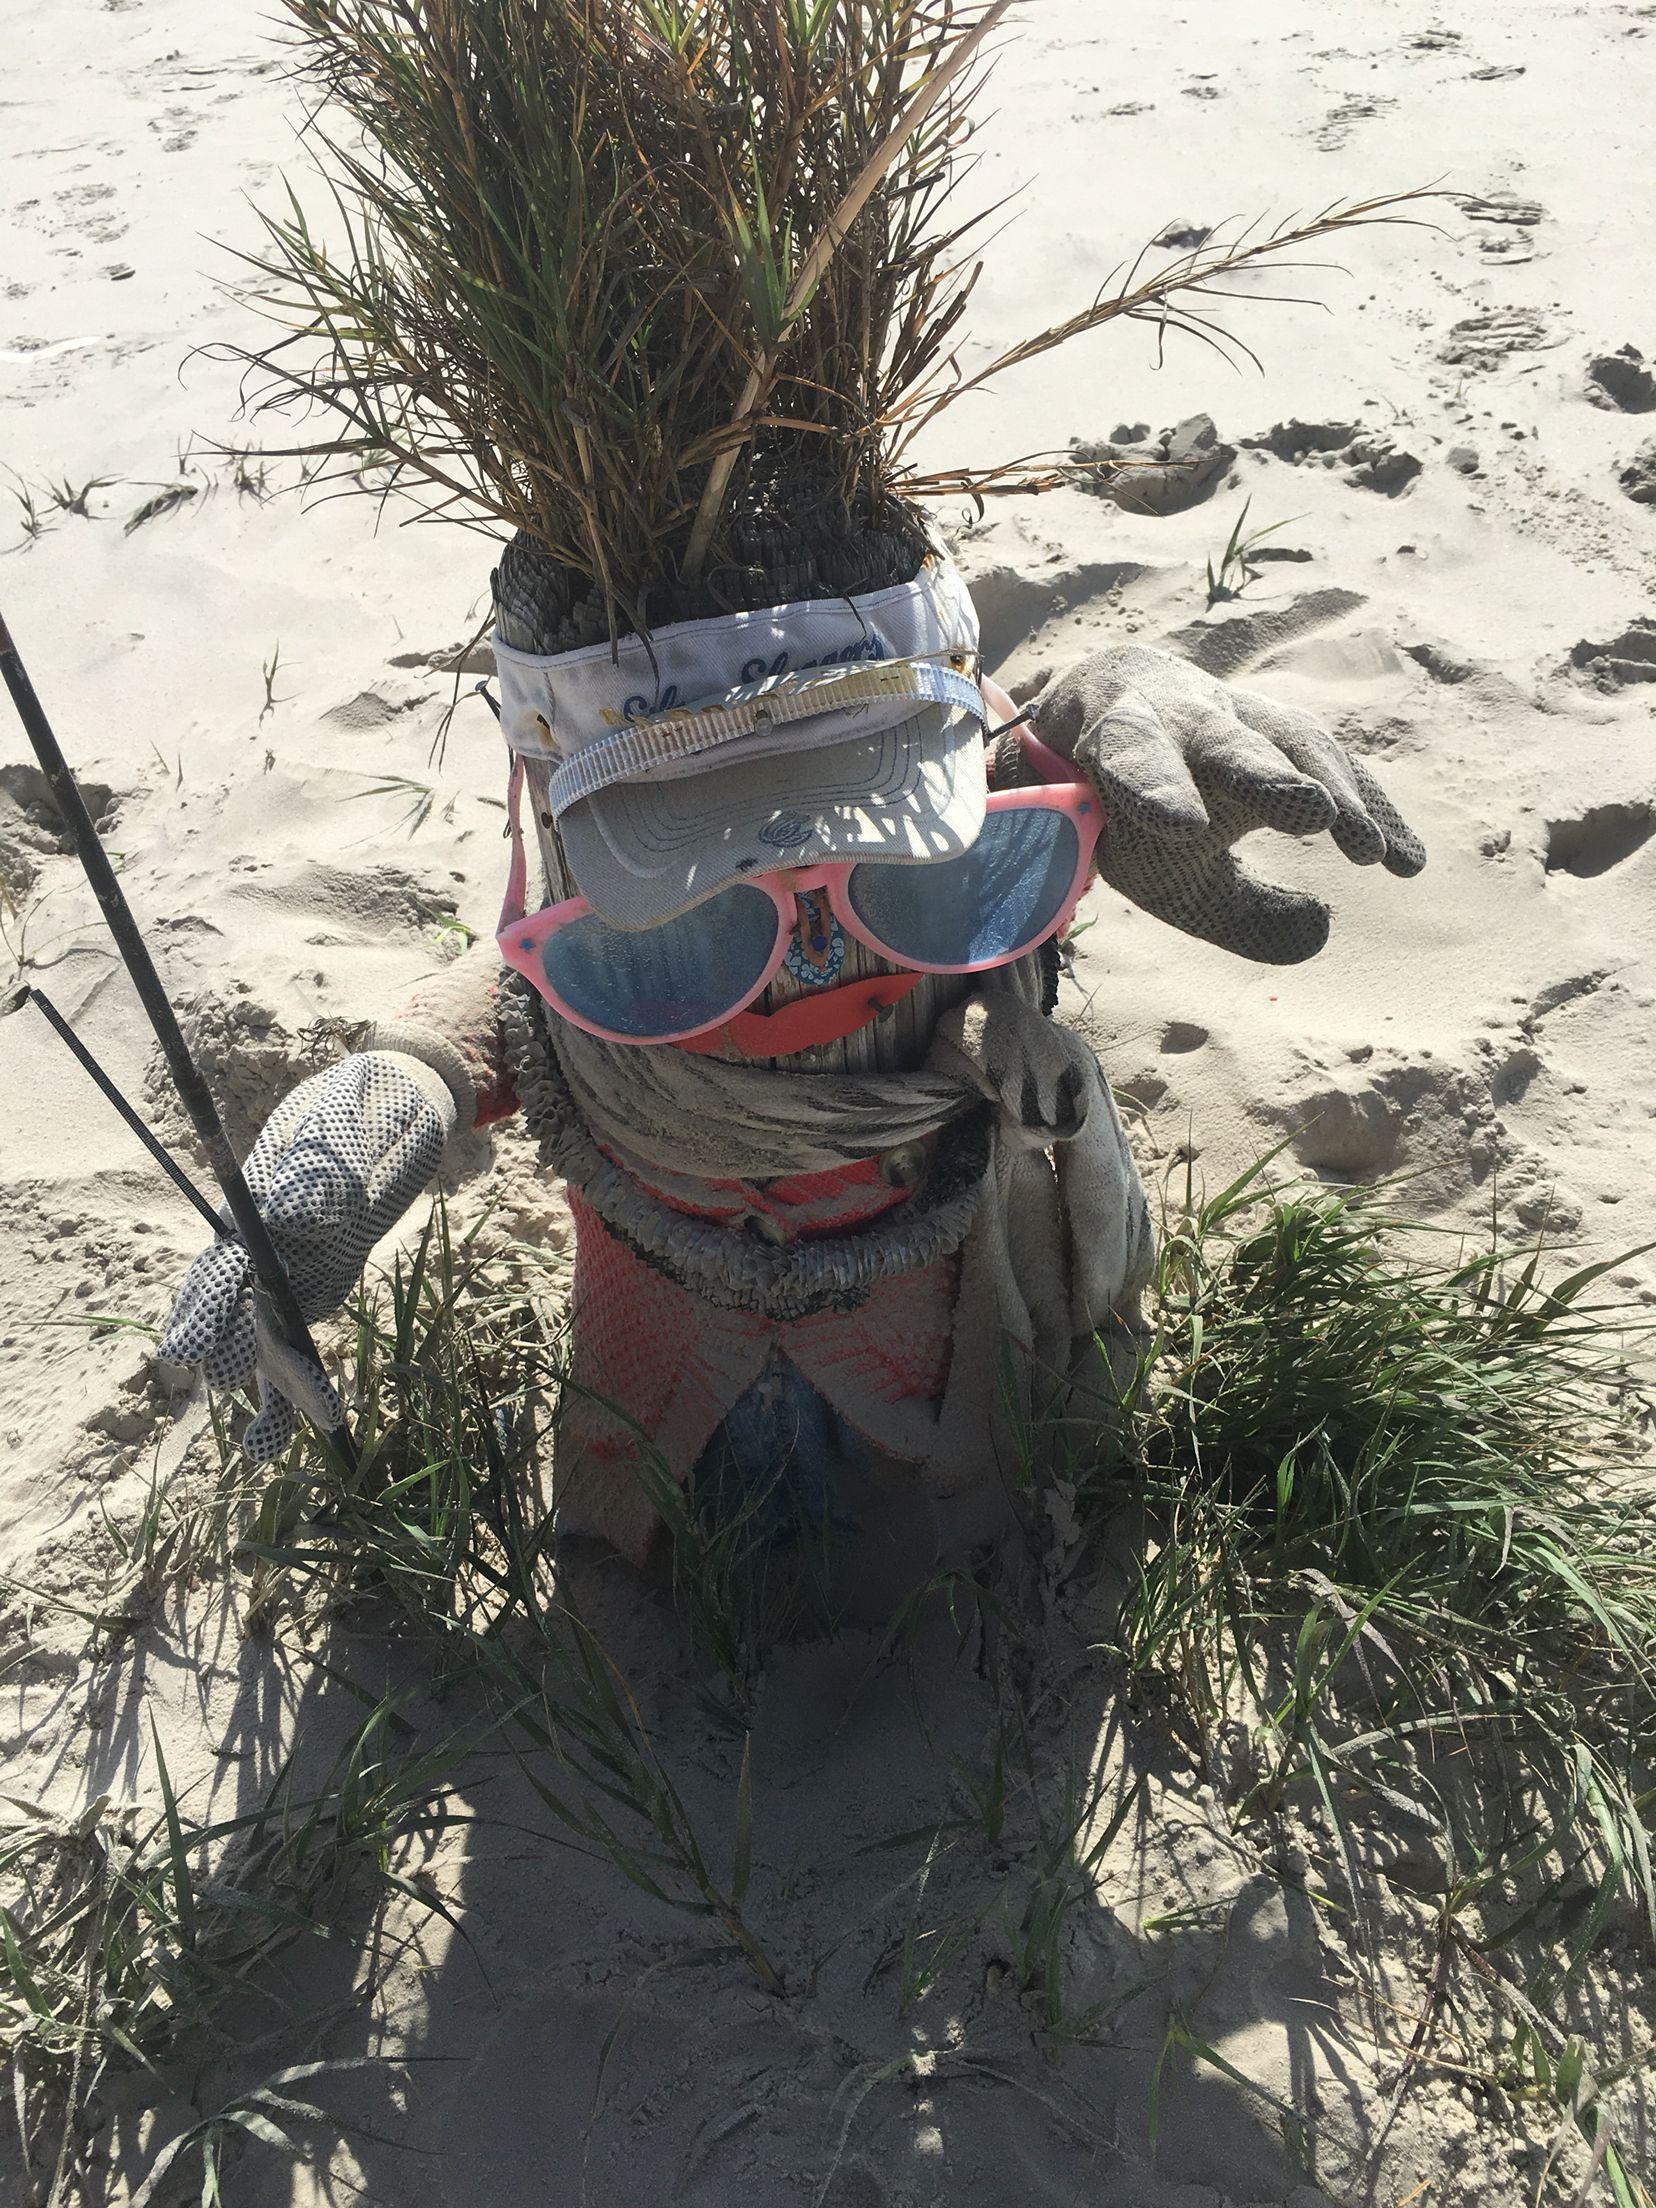 Greeter at port aransas beach texas port aransas beach